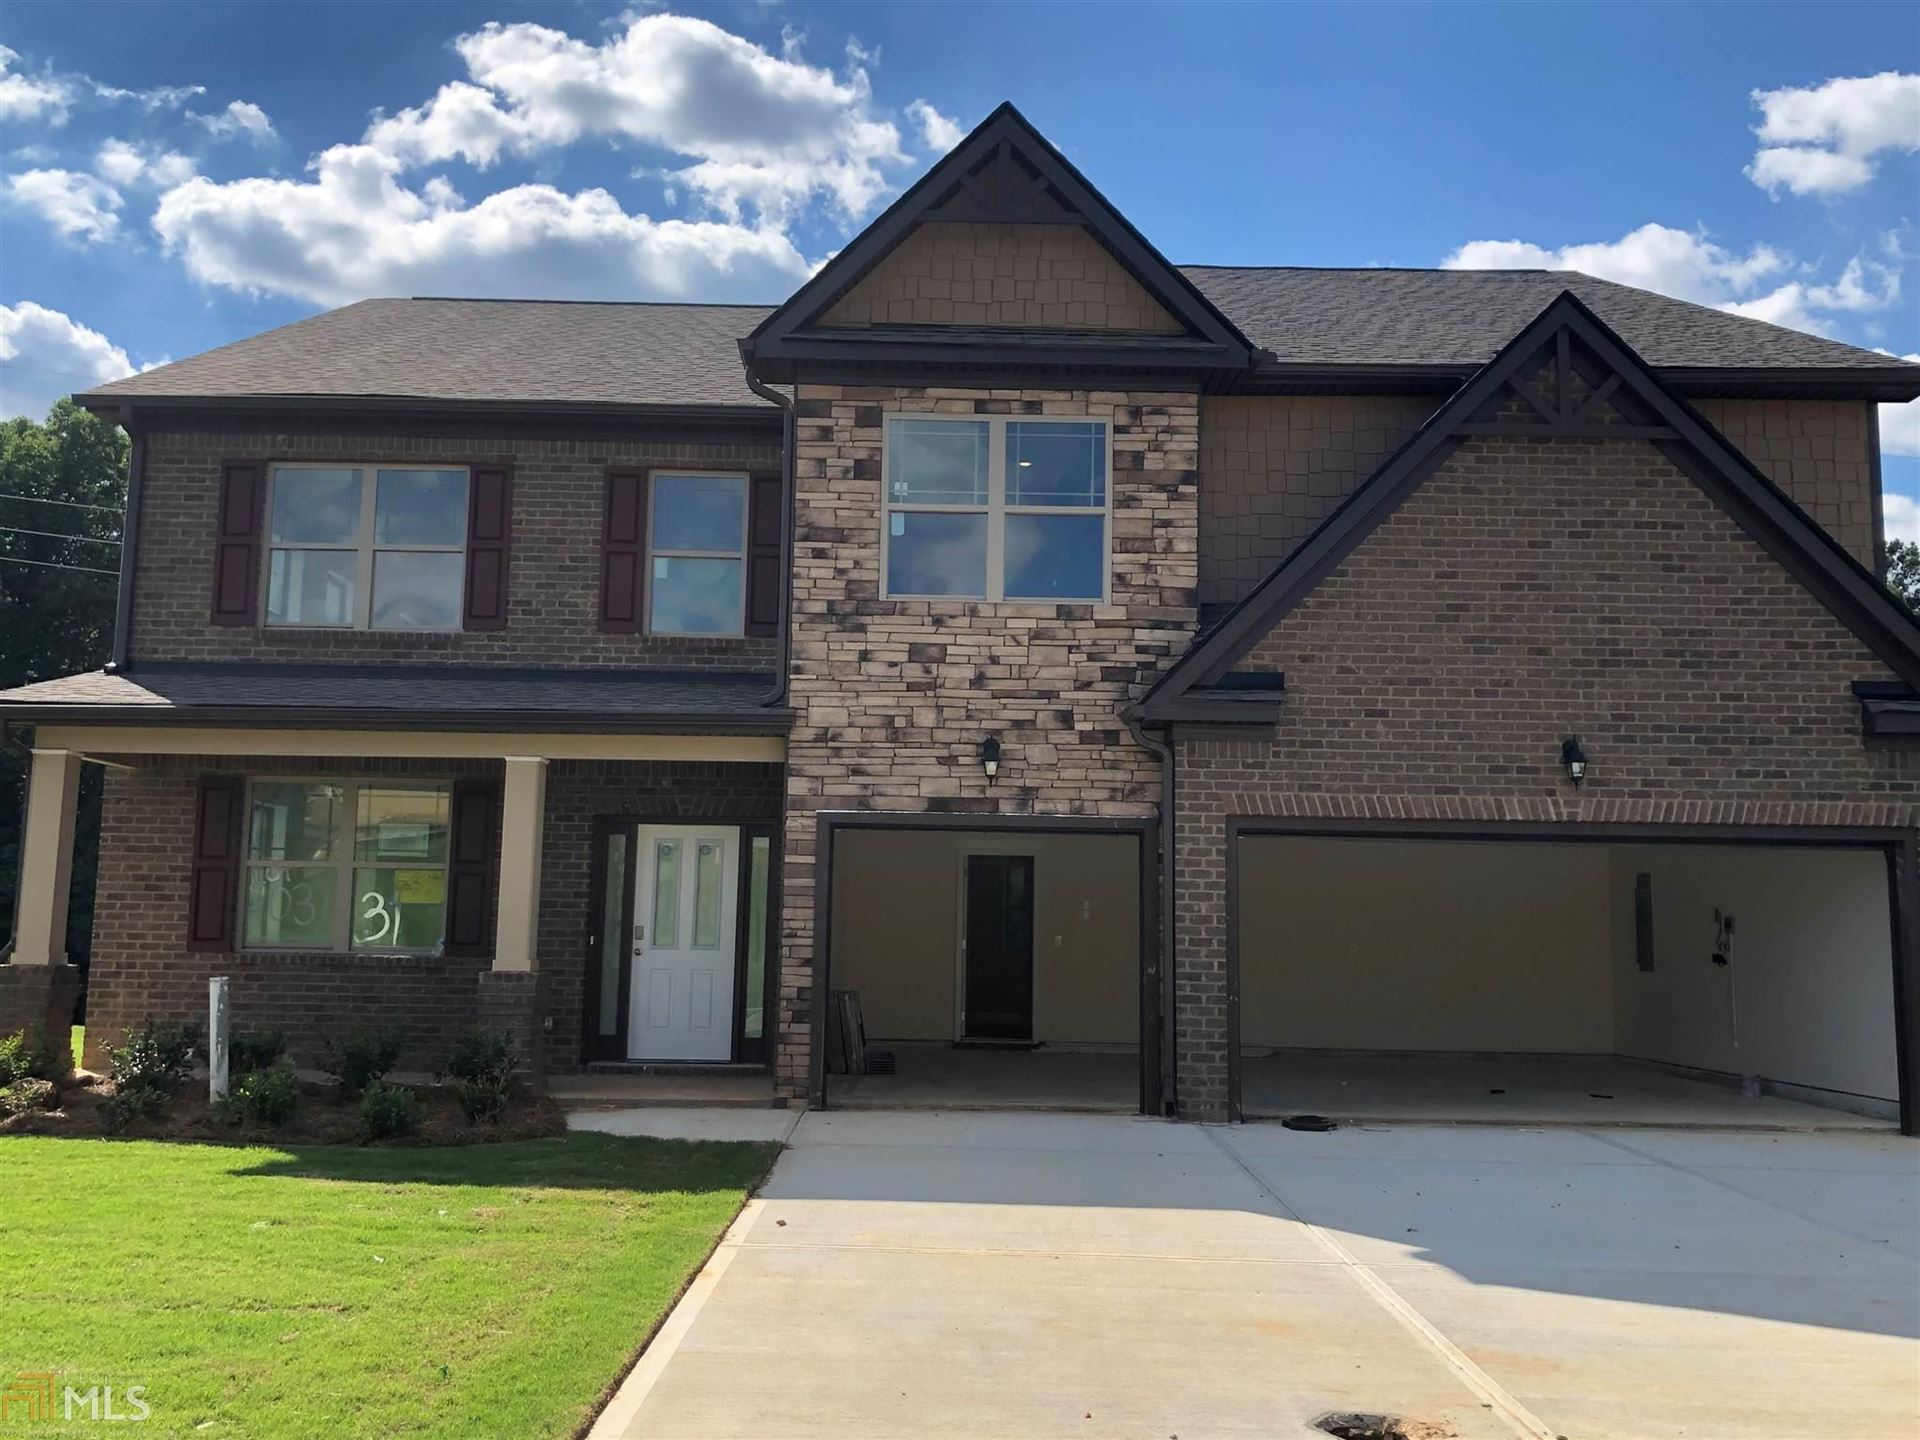 2815 Ridge Manor Dr, Dacula, GA 30019 - MLS#: 8899097